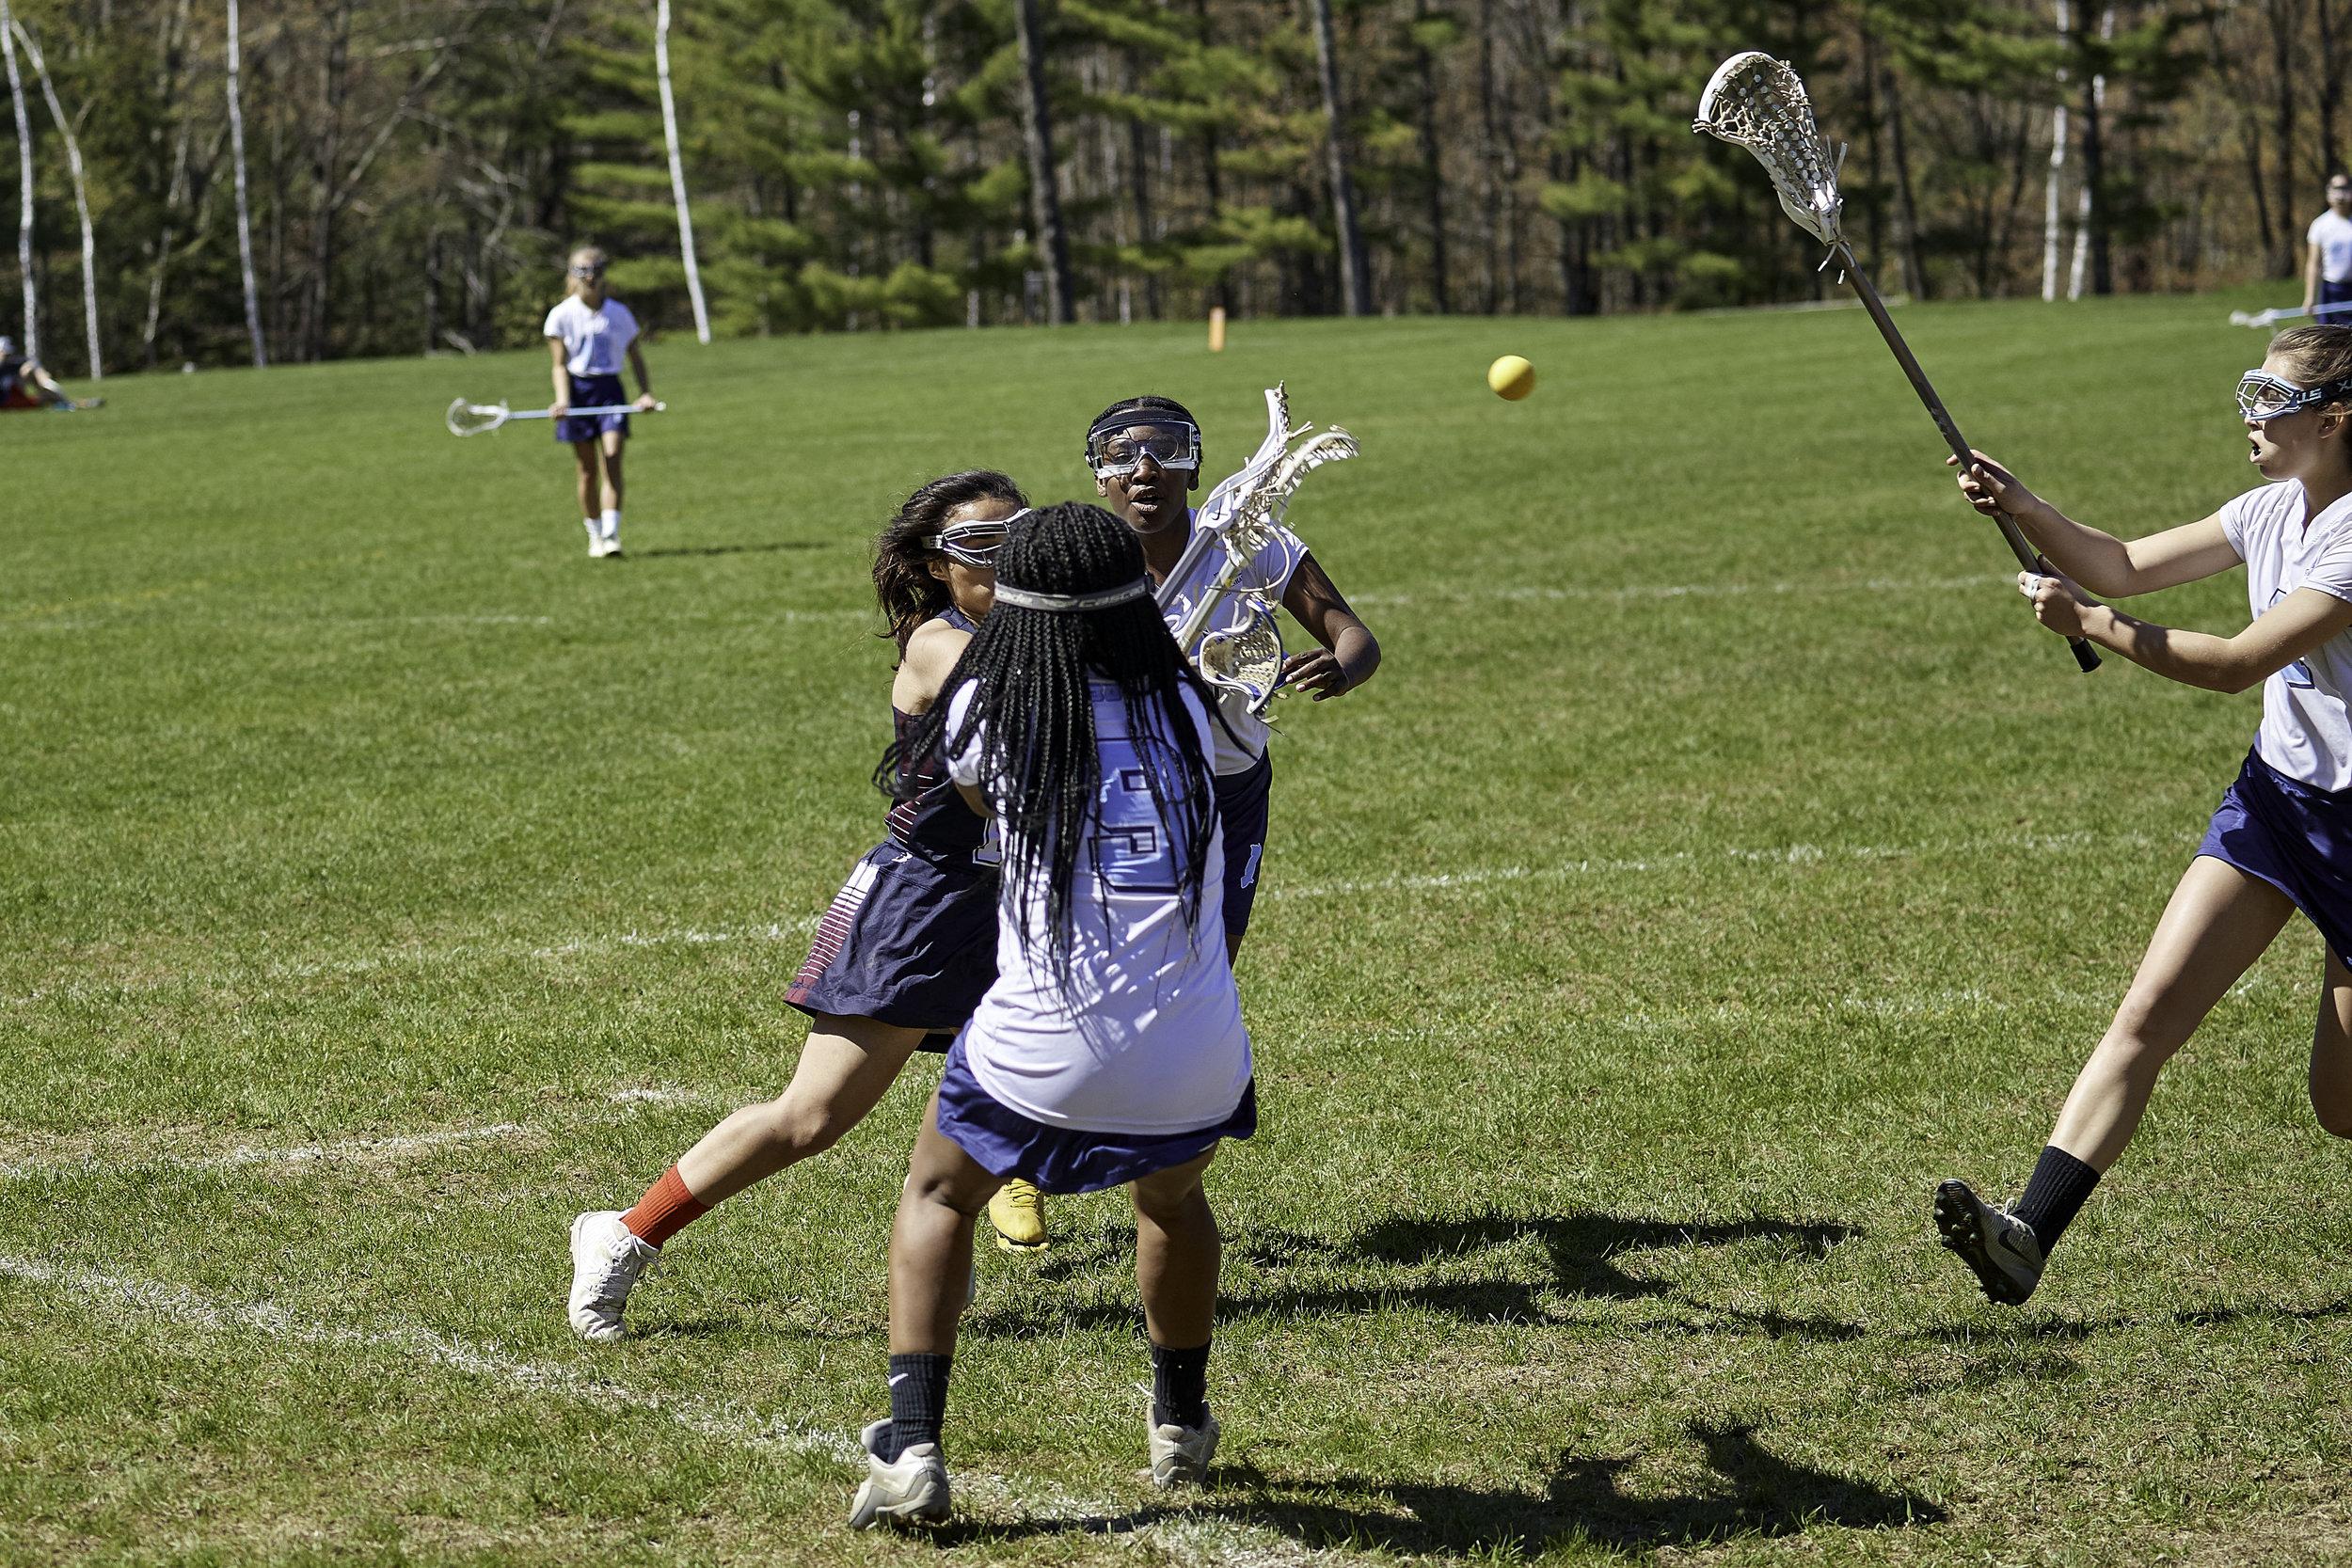 Girls Lacrosse vs. Stoneleigh Burnham School - May 11, 2019 - May 10, 2019193380.jpg